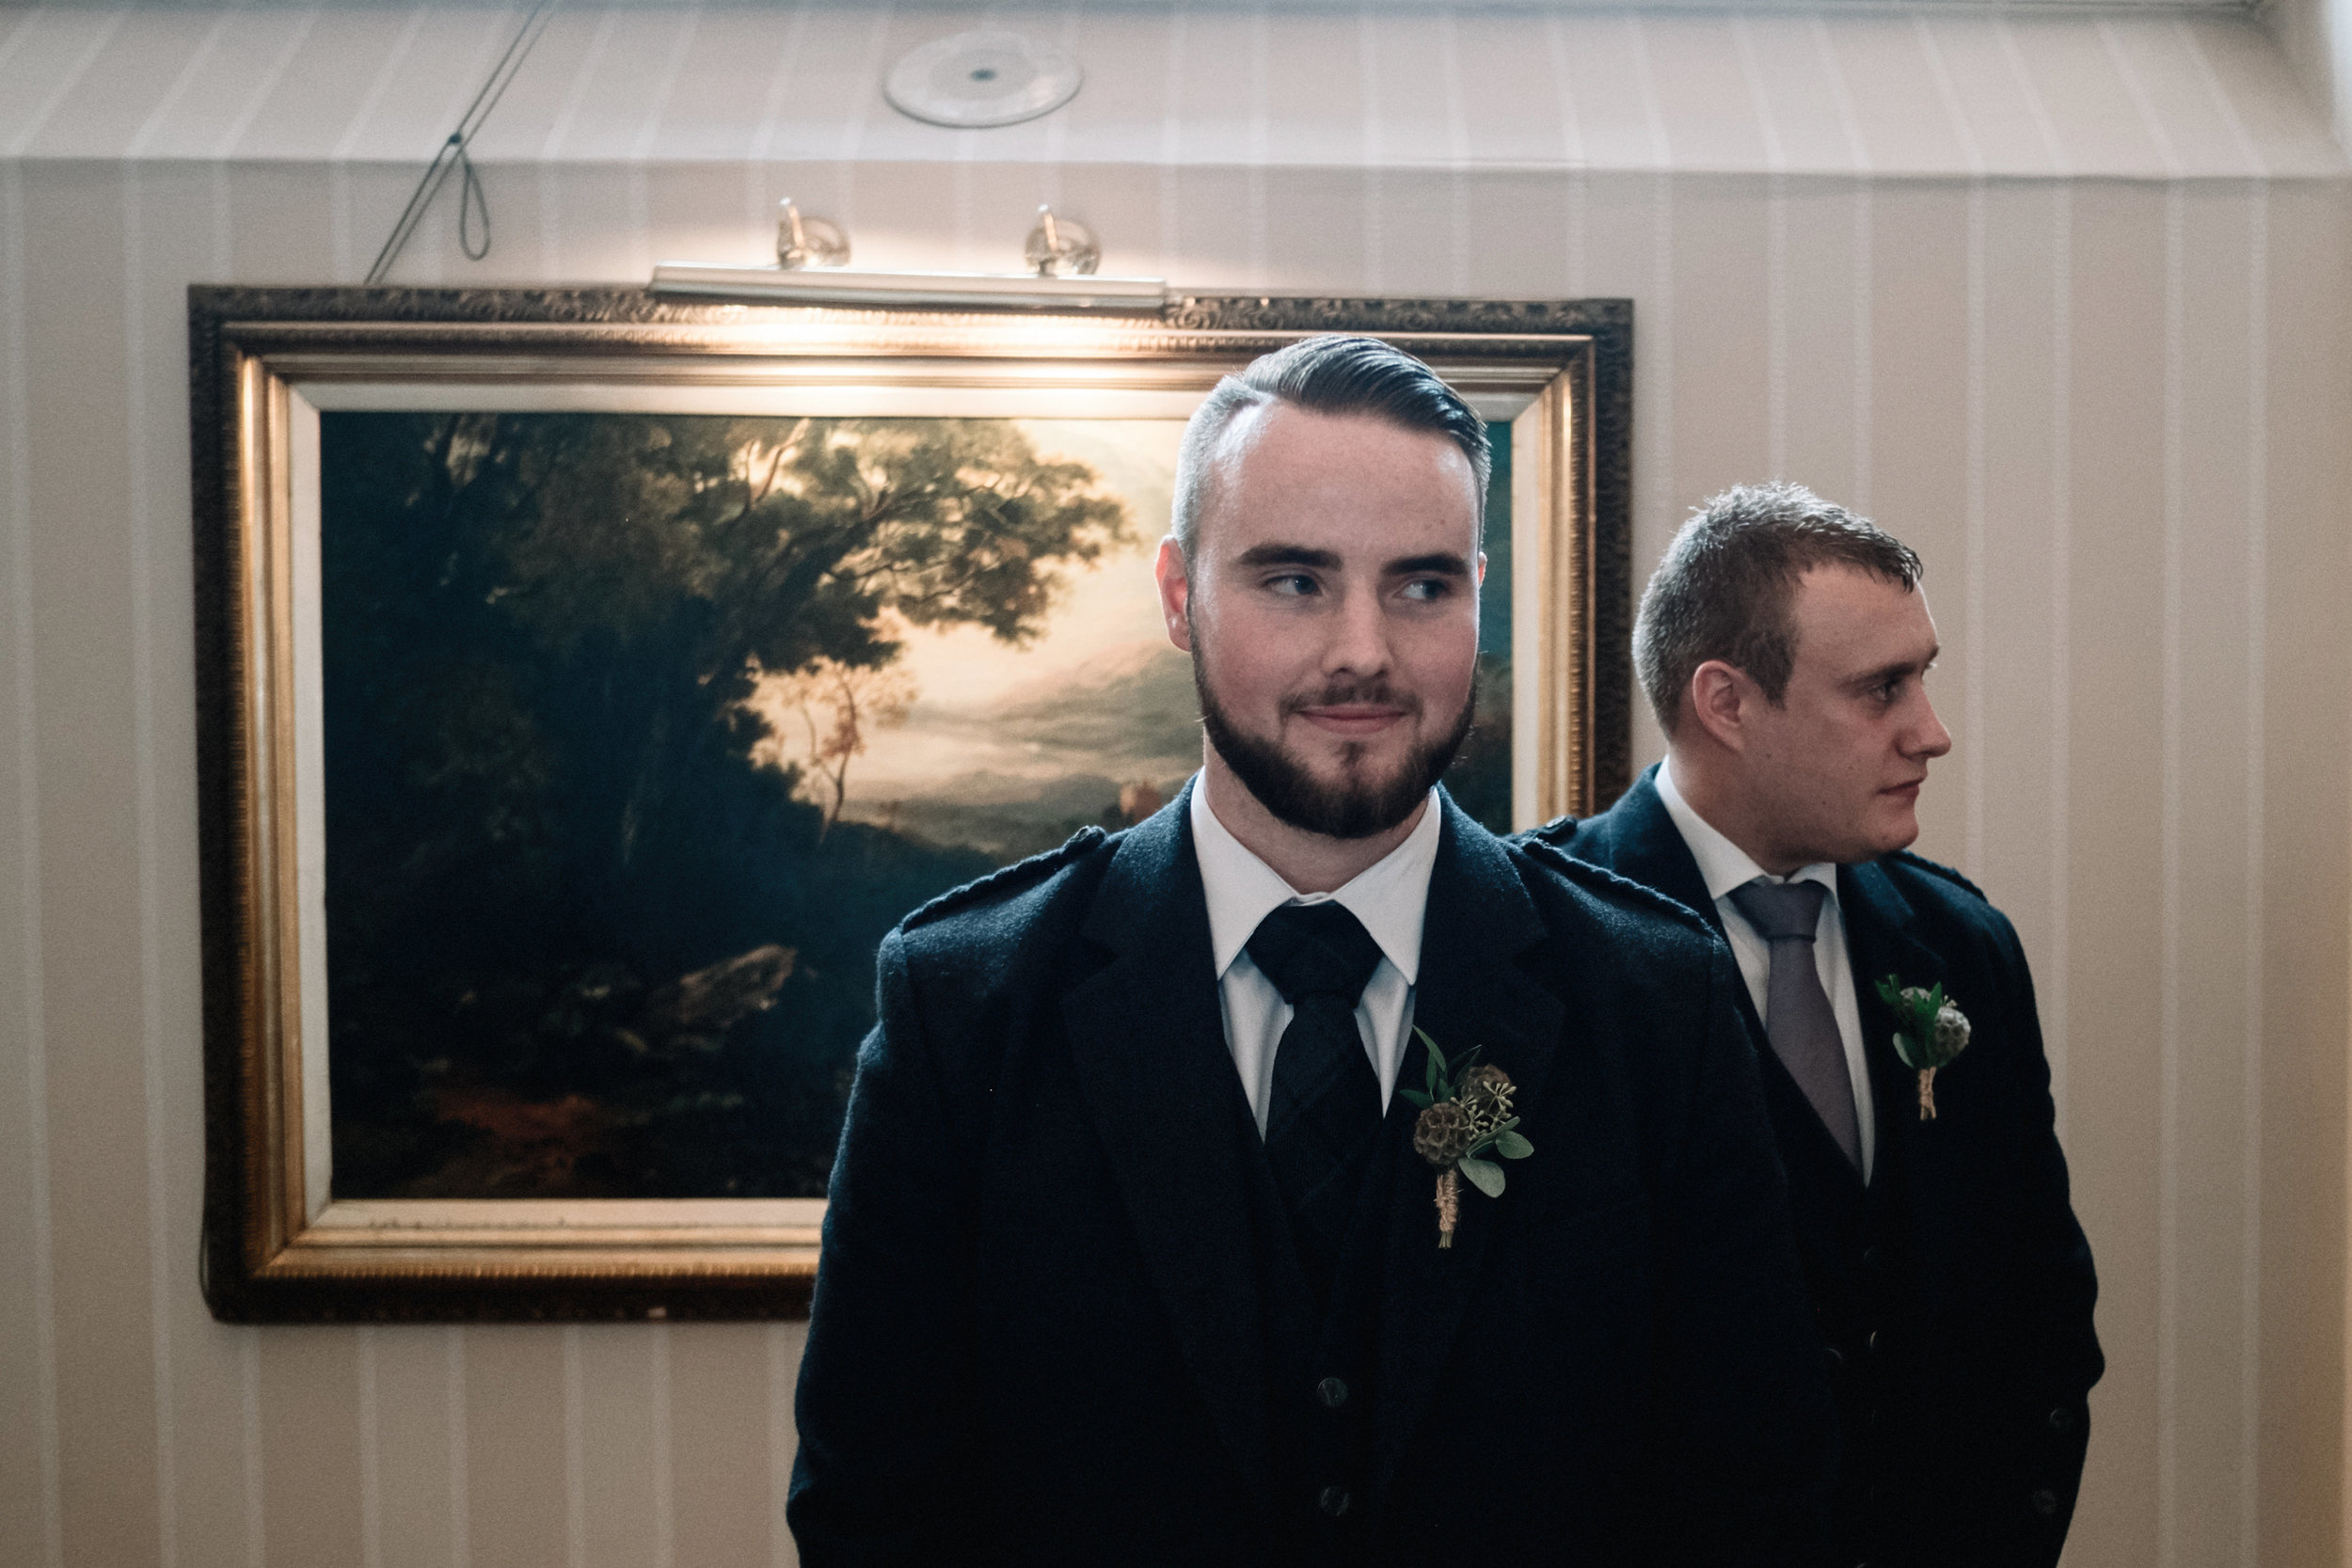 Nervous groom waits on his bride